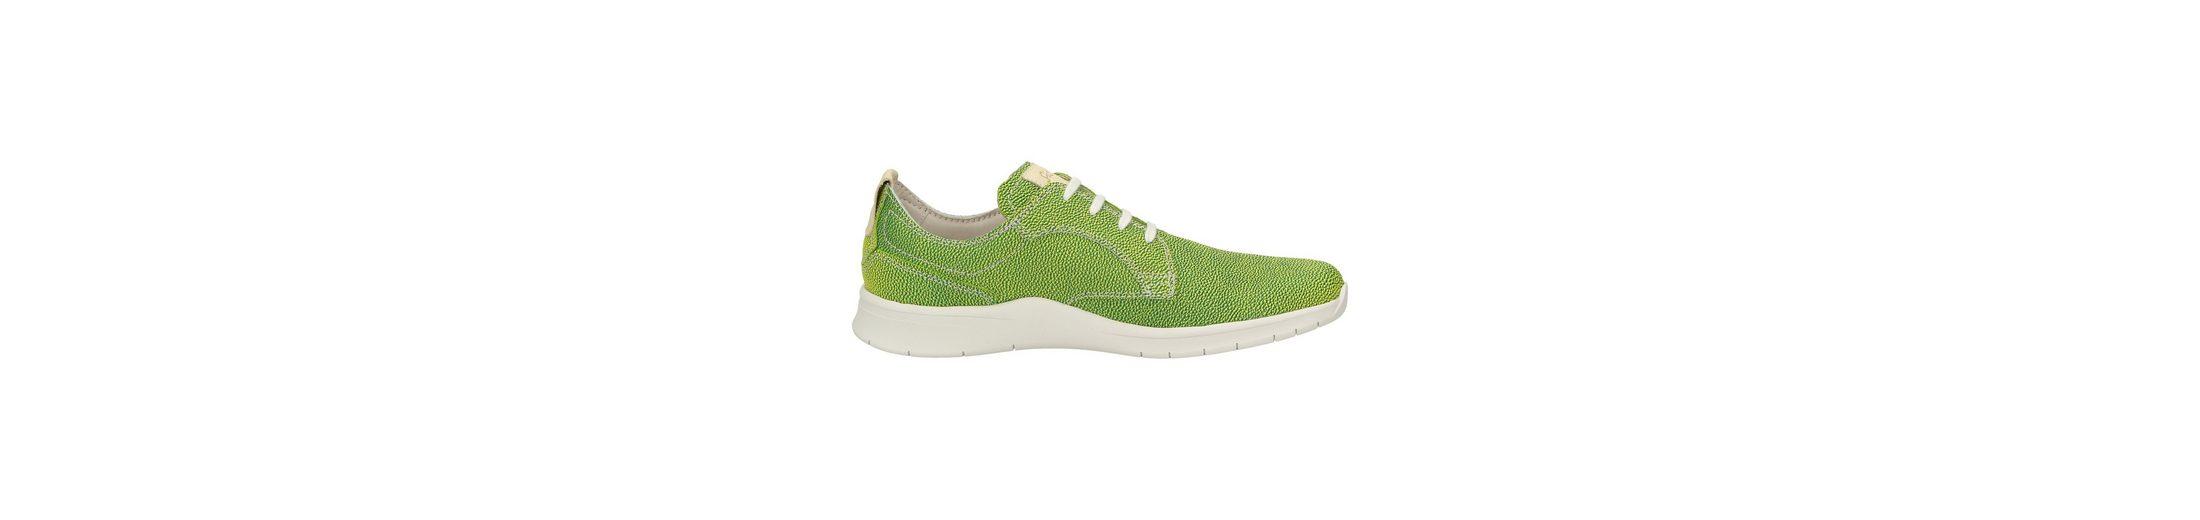 Rabatt Top-Qualität SIOUX Heimito-700-XL Sneaker Billig Verkauf Beliebt WTtwV024